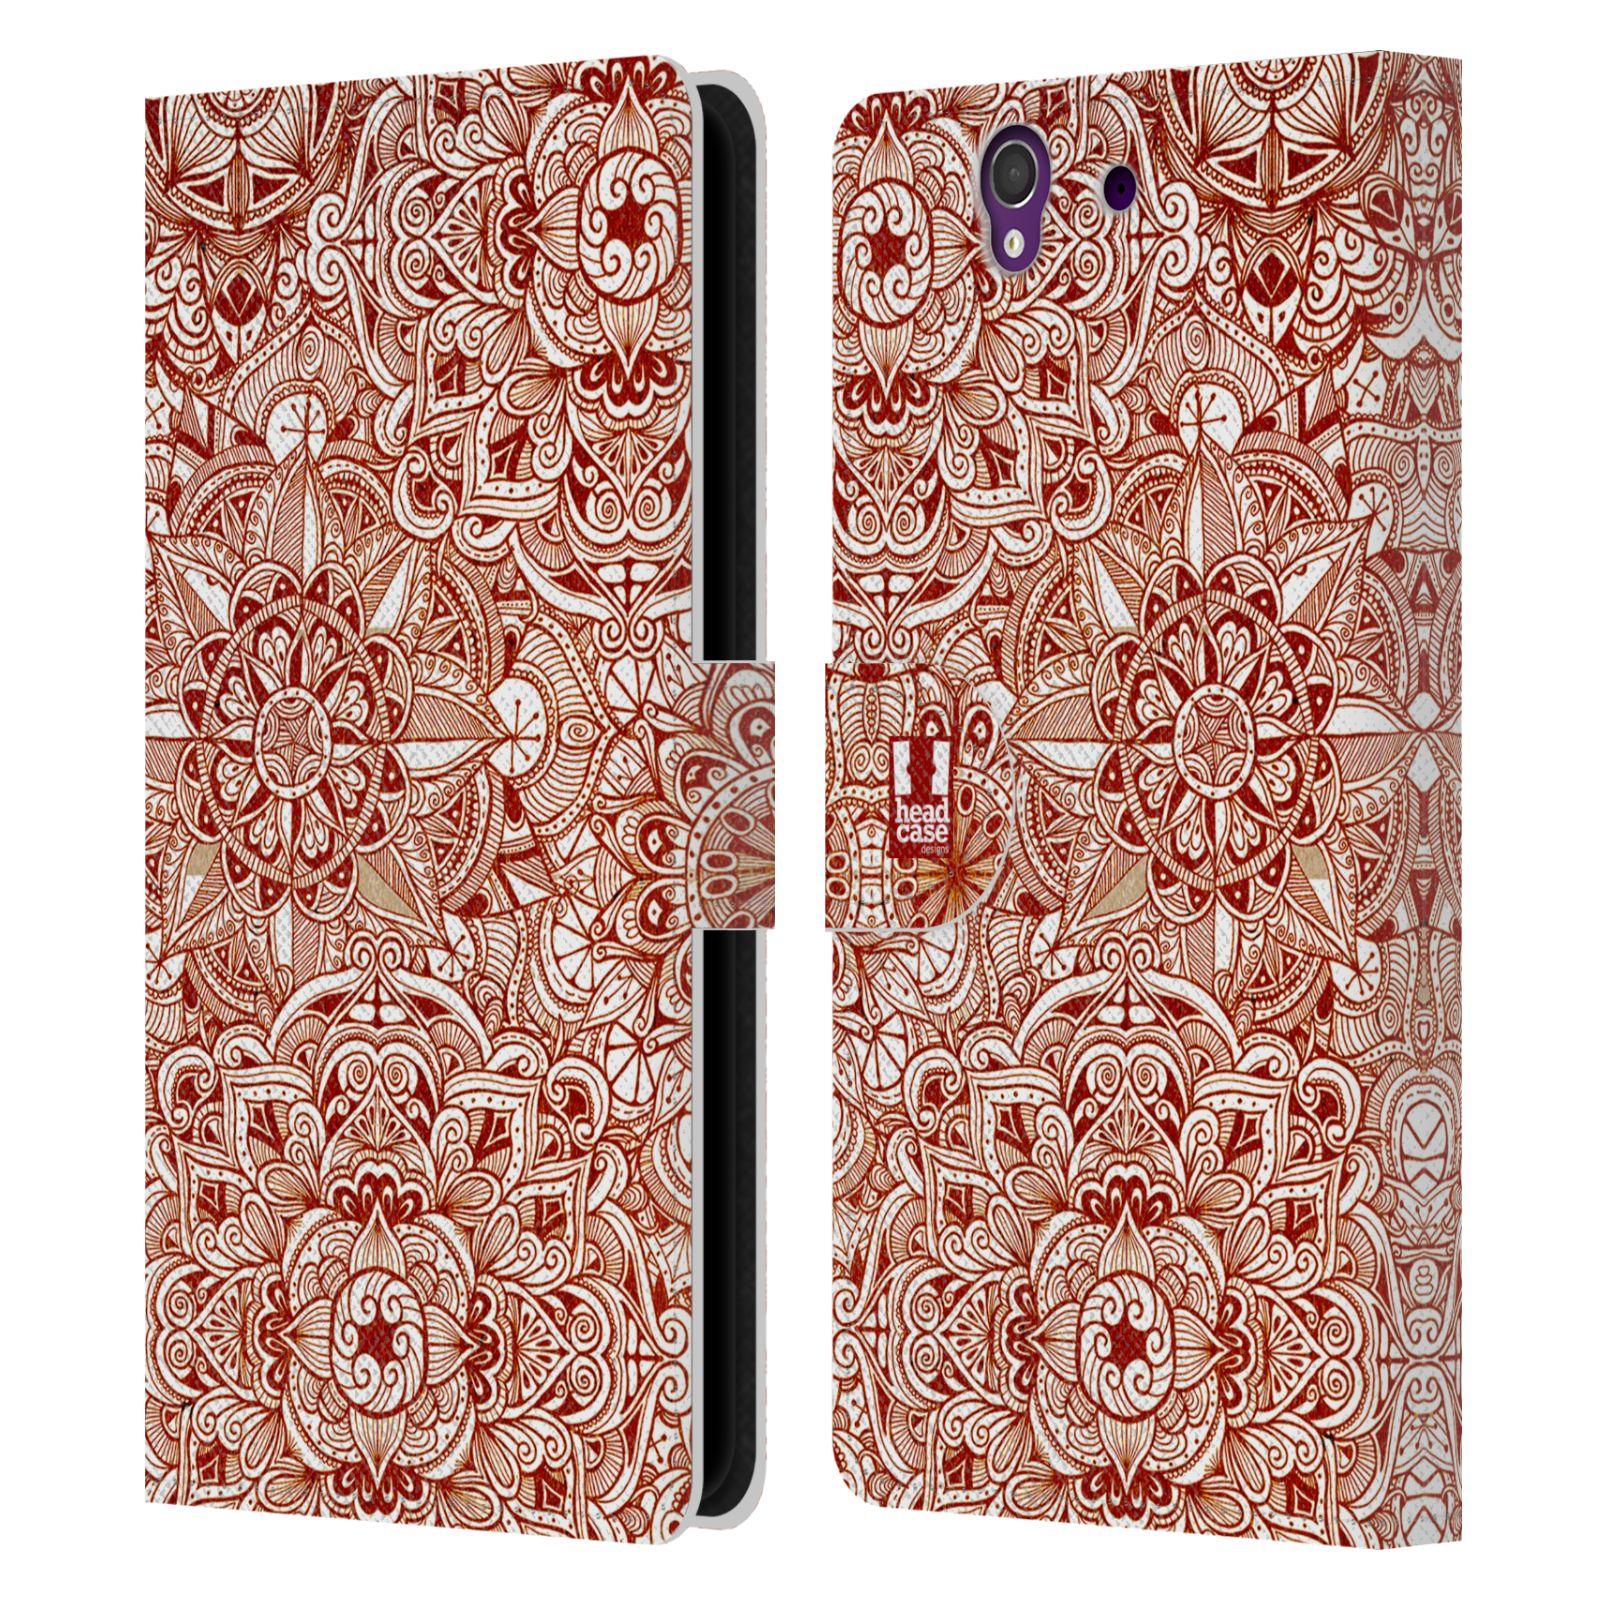 HEAD CASE Flipové pouzdro pro mobil SONY XPERIA Z (C6603) mandala kreslená červená